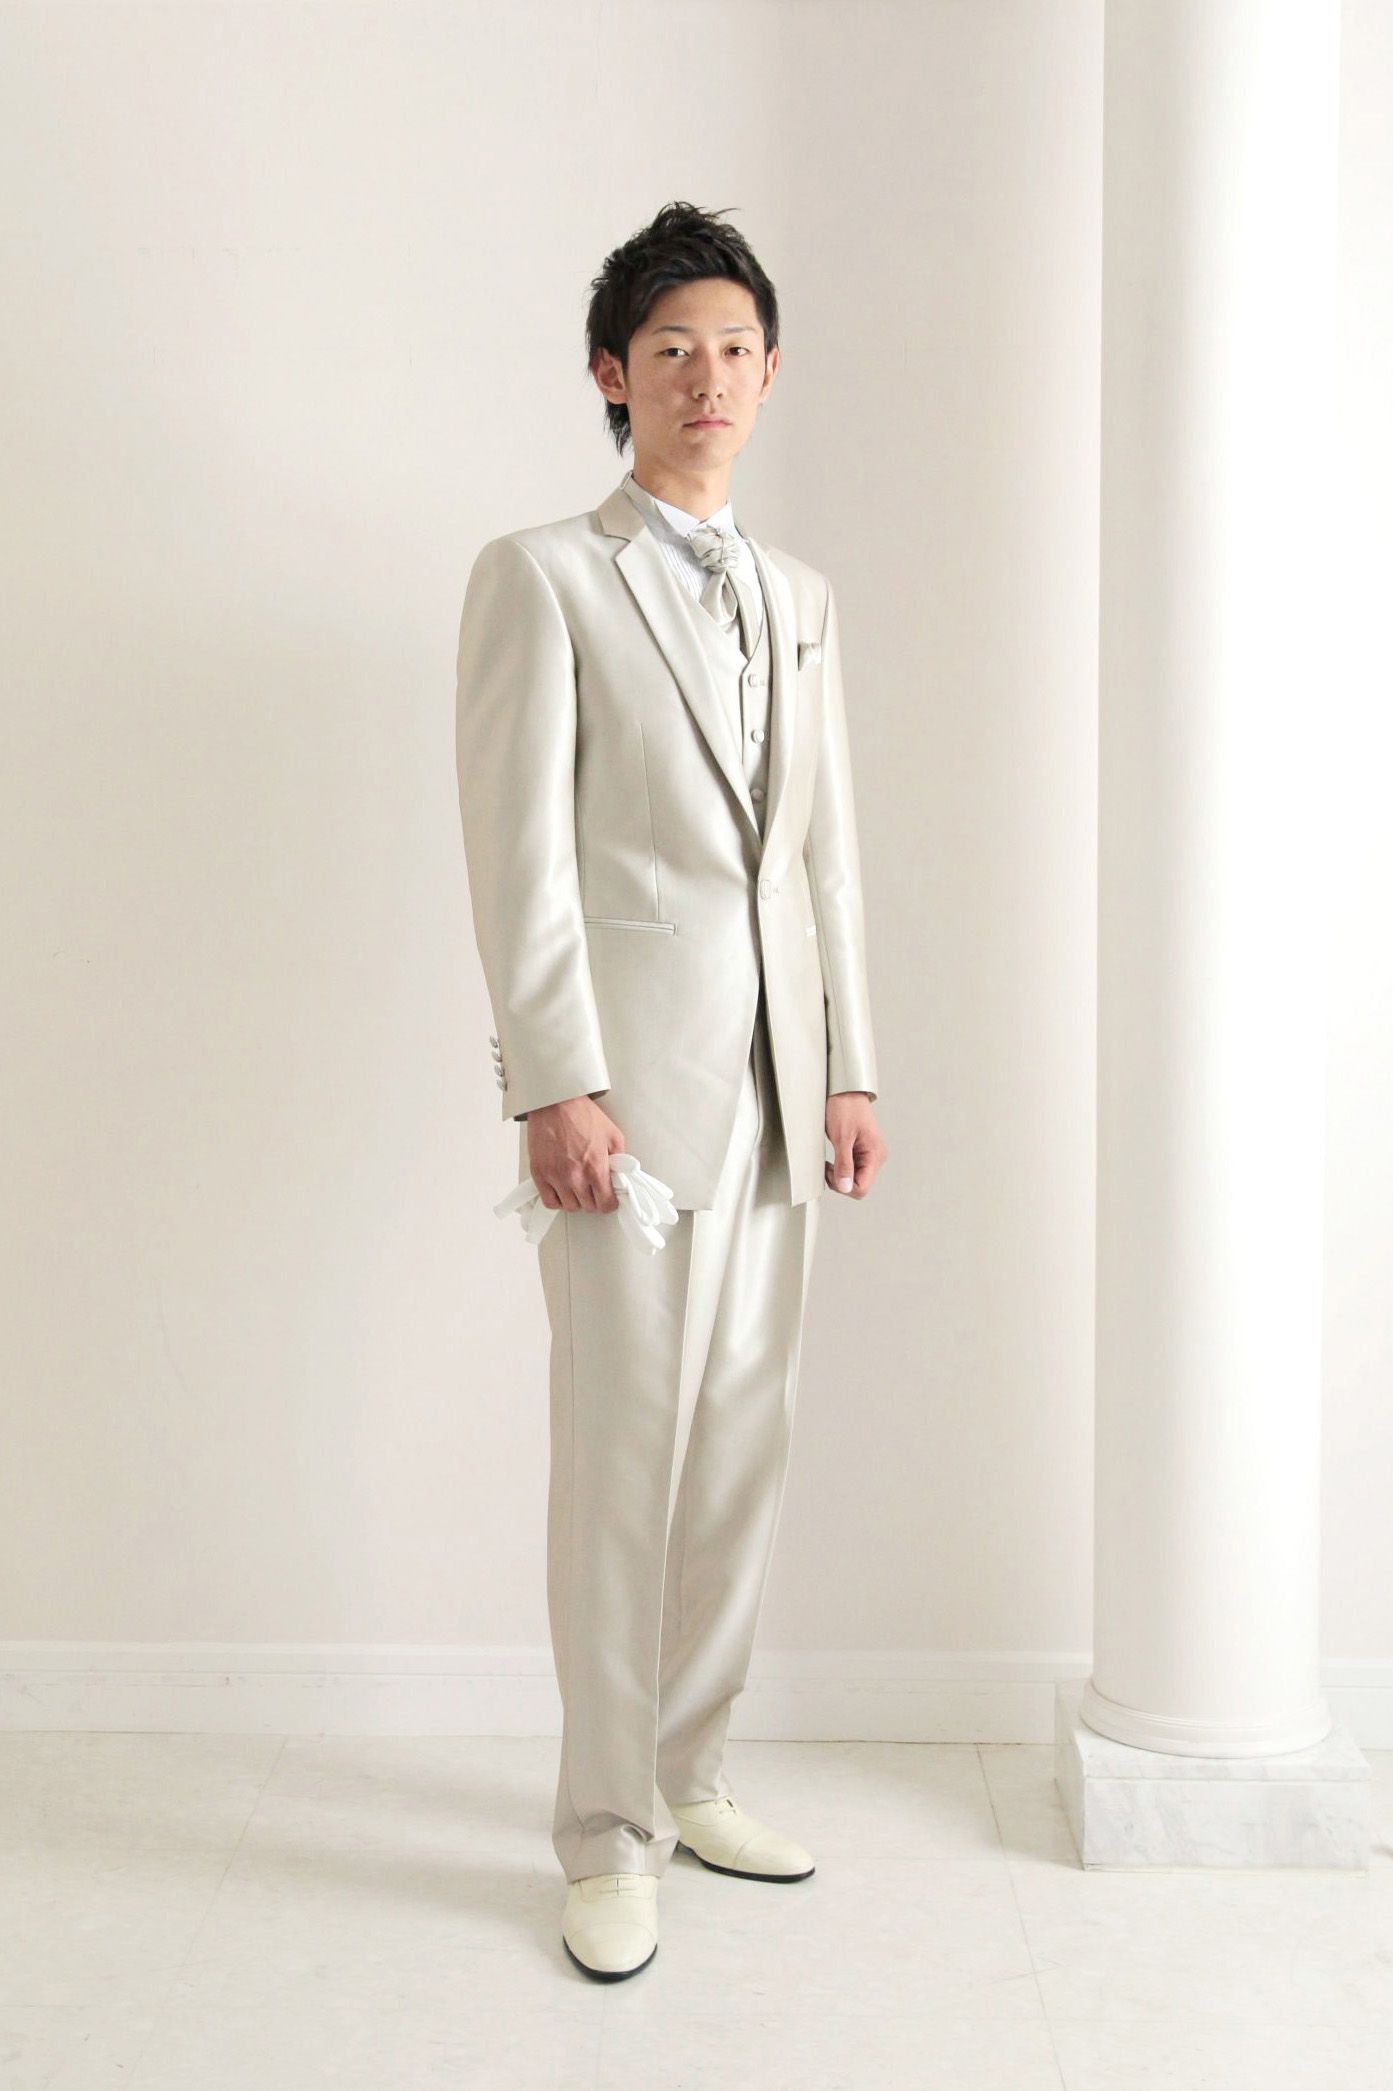 姫路店 男性衣装 T001 S